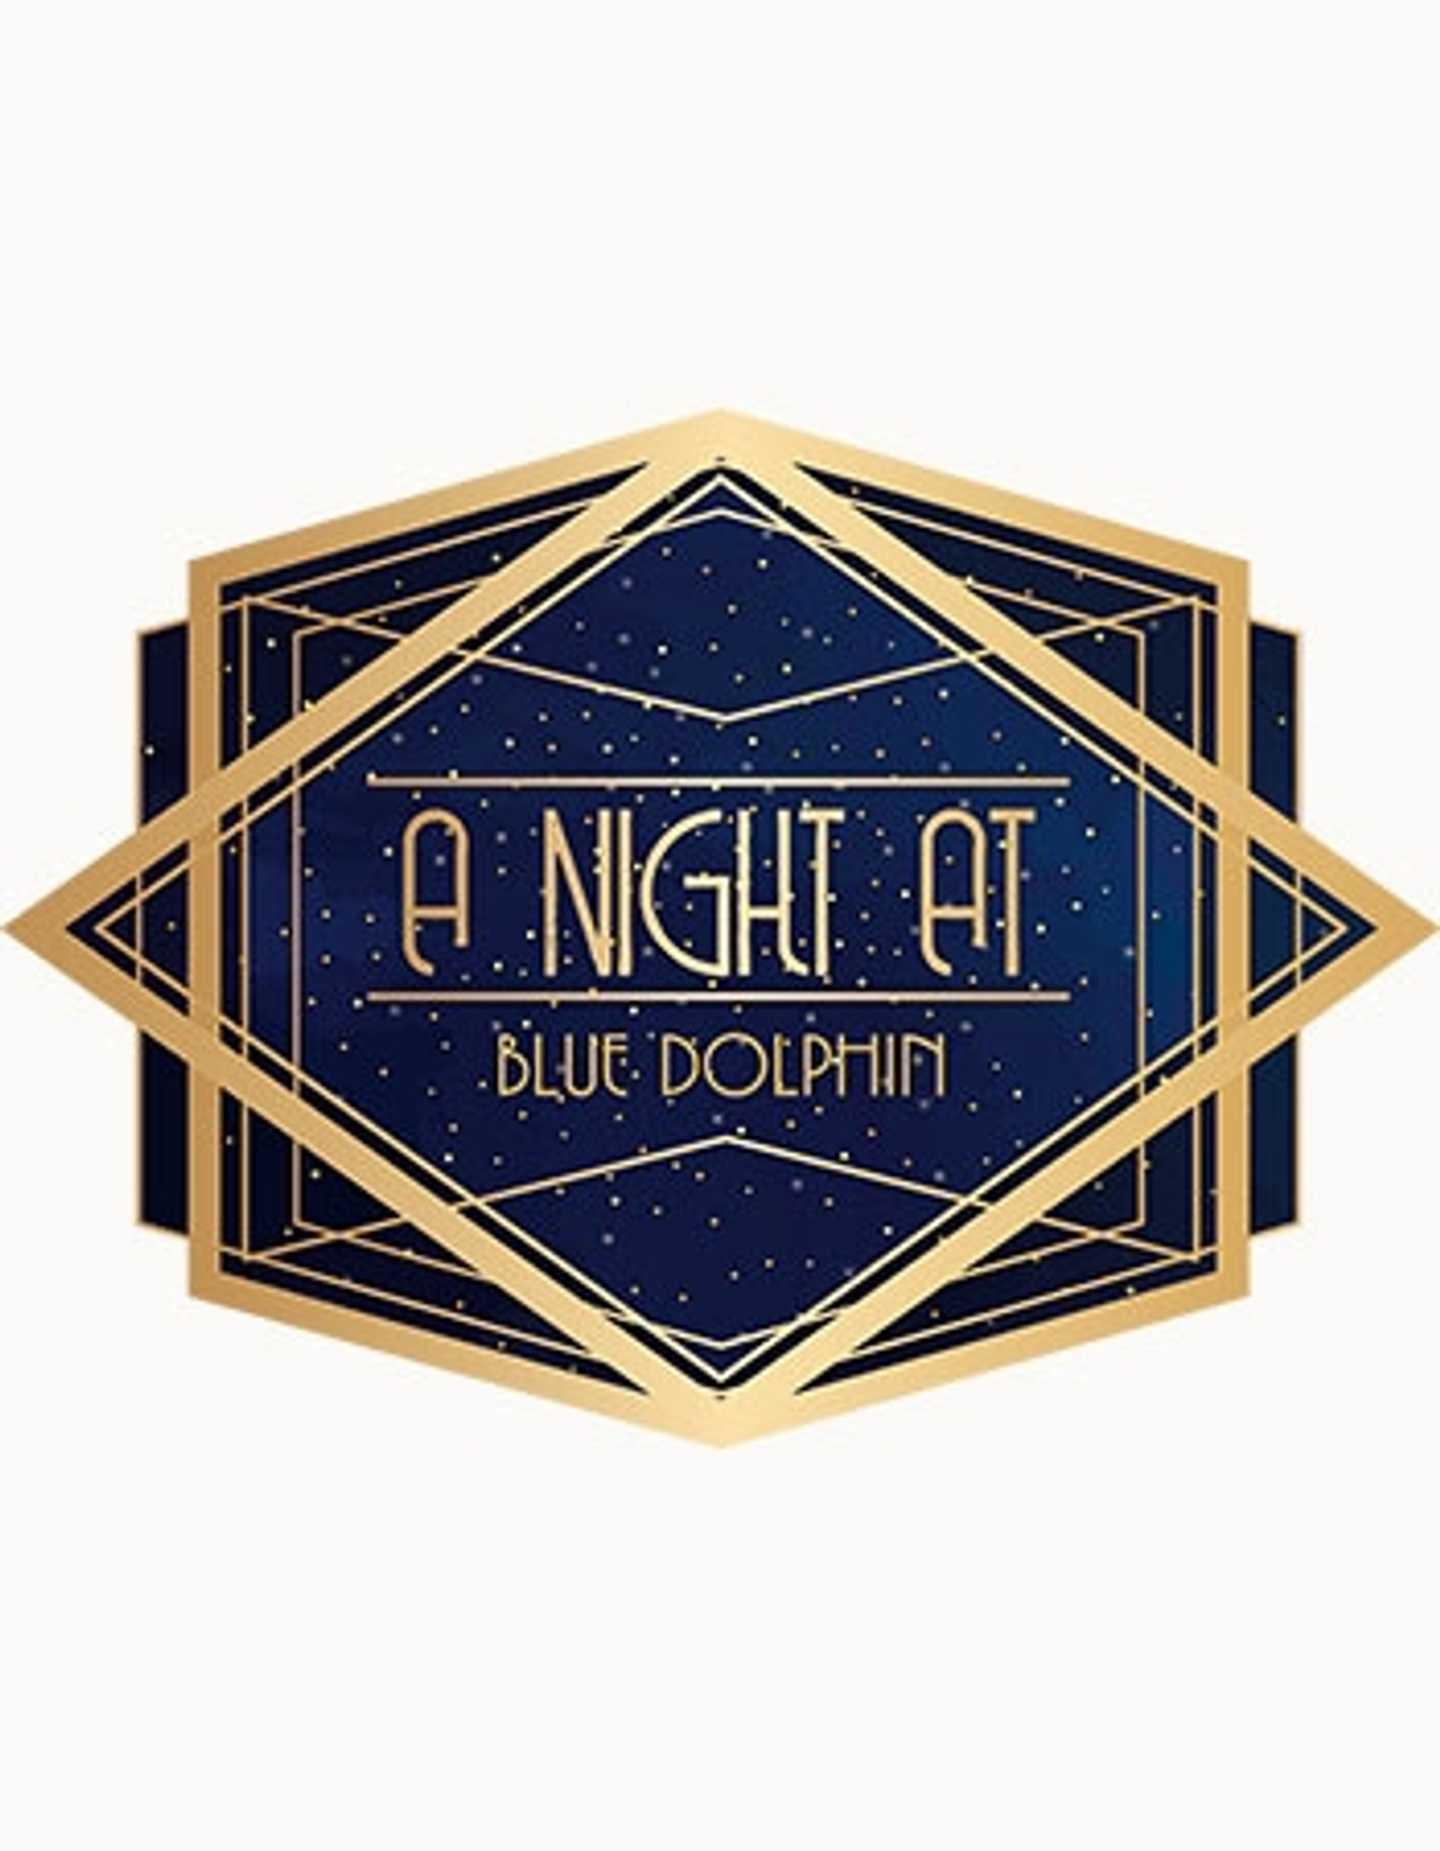 A night @ Blue Dolphin